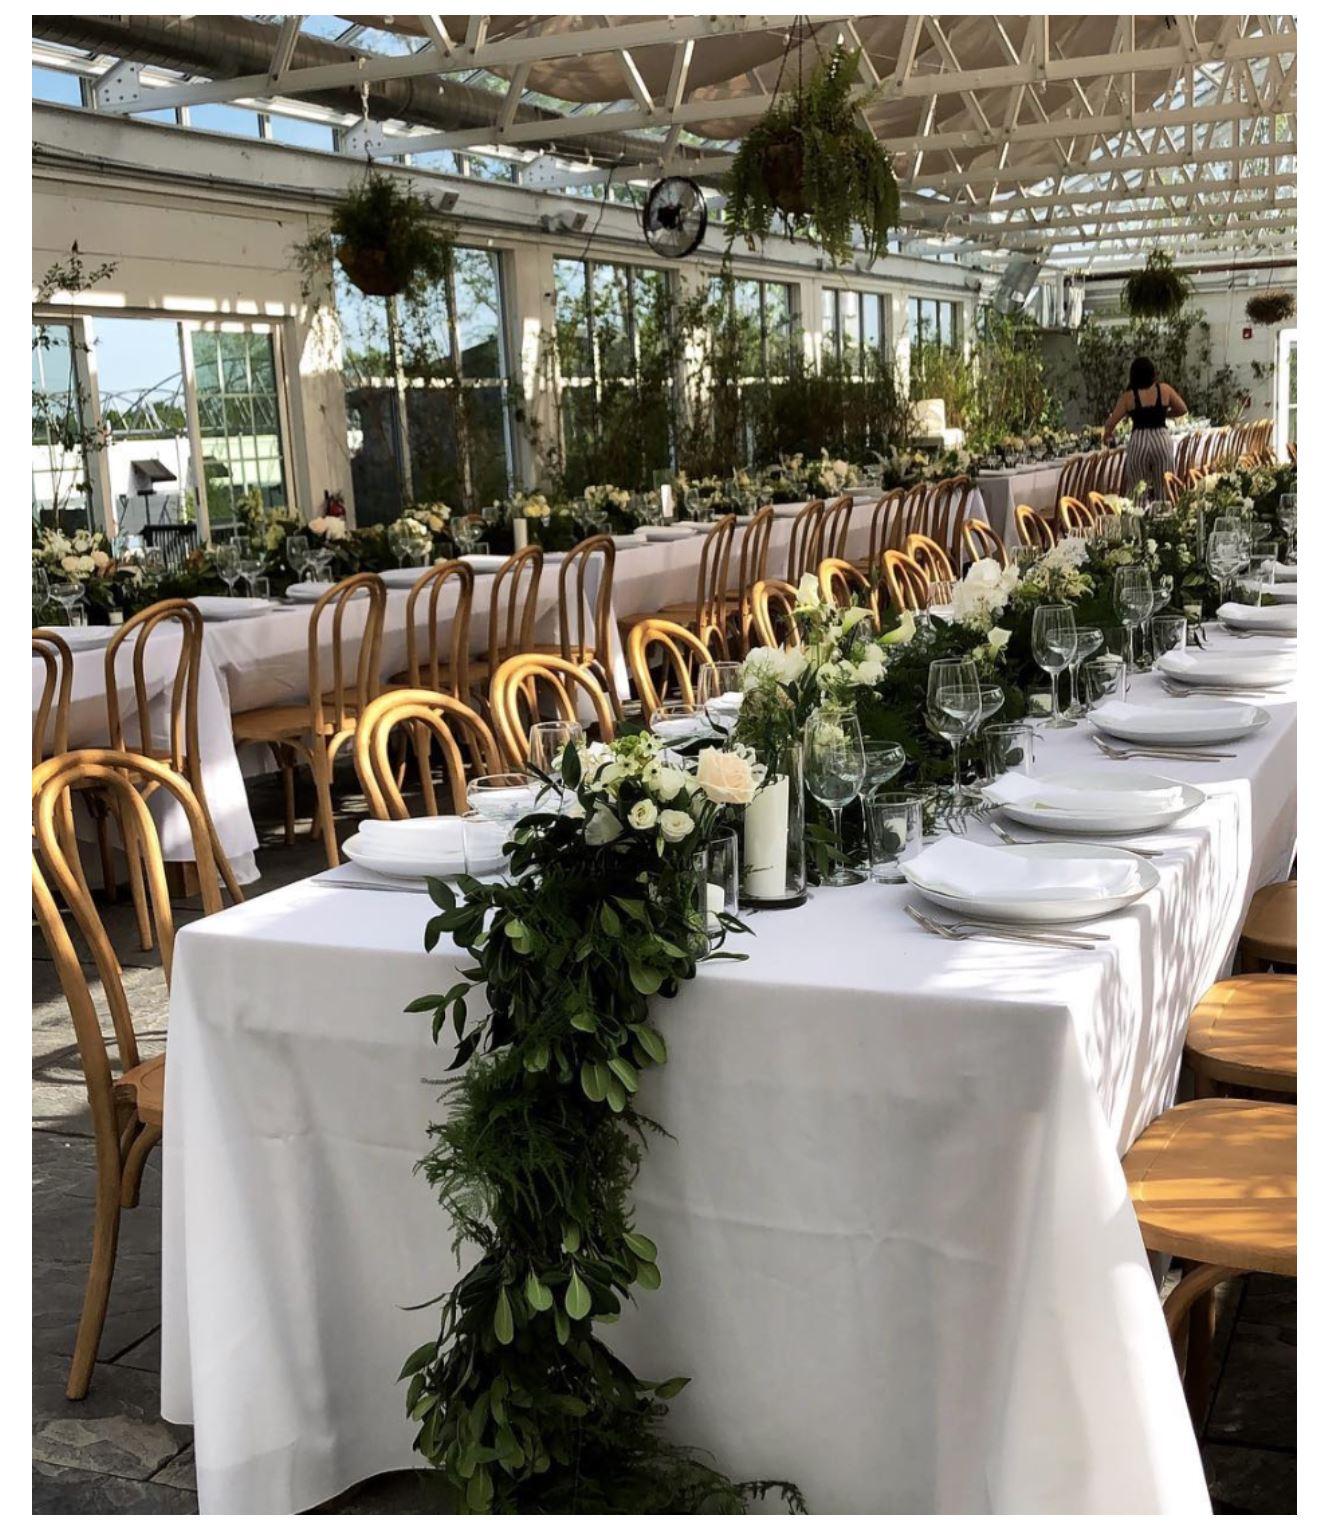 Wedding Venues In Hudson Valley Ny: HUDSON VALLEY GREEN